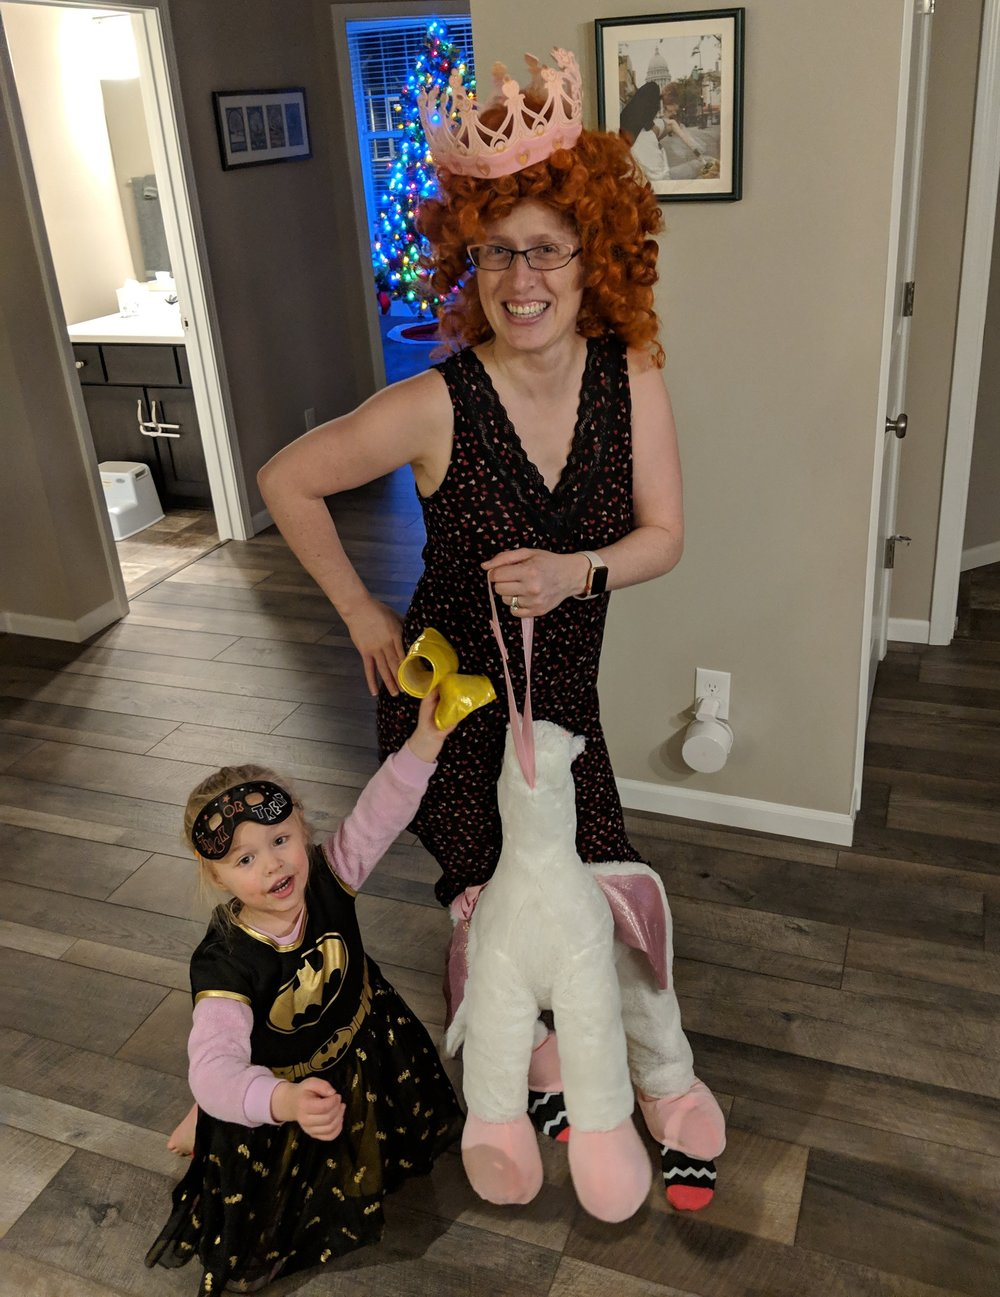 horsing around at home